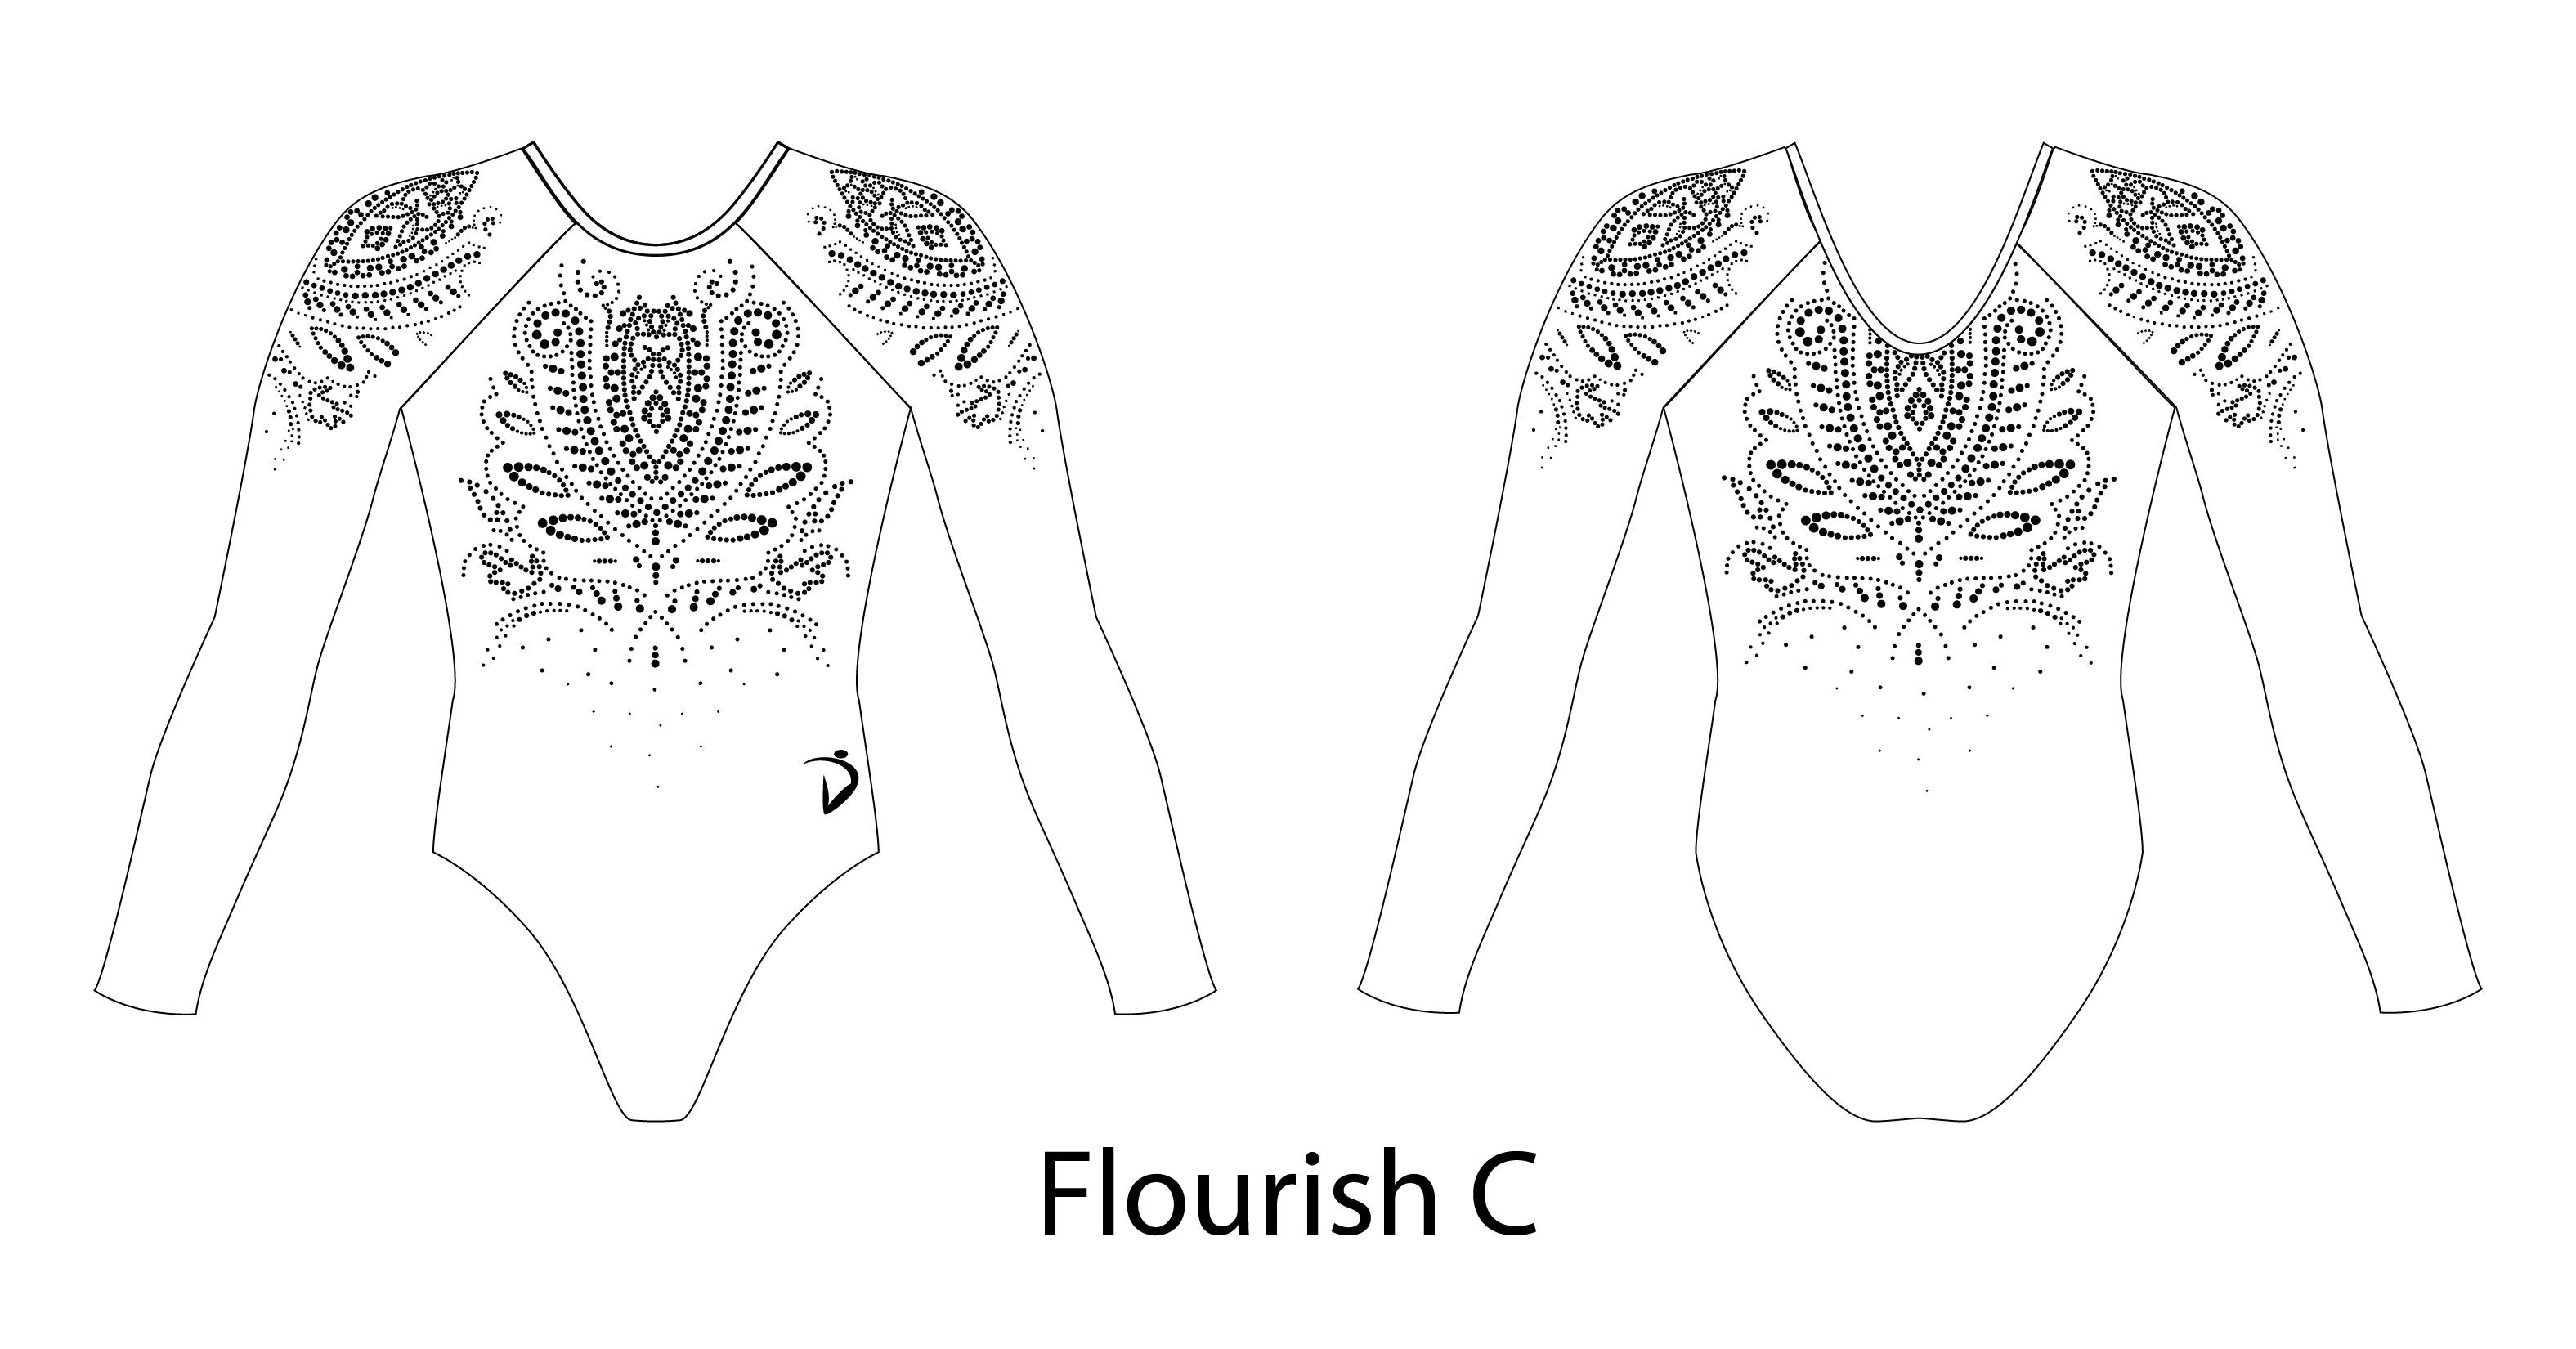 Flourish C